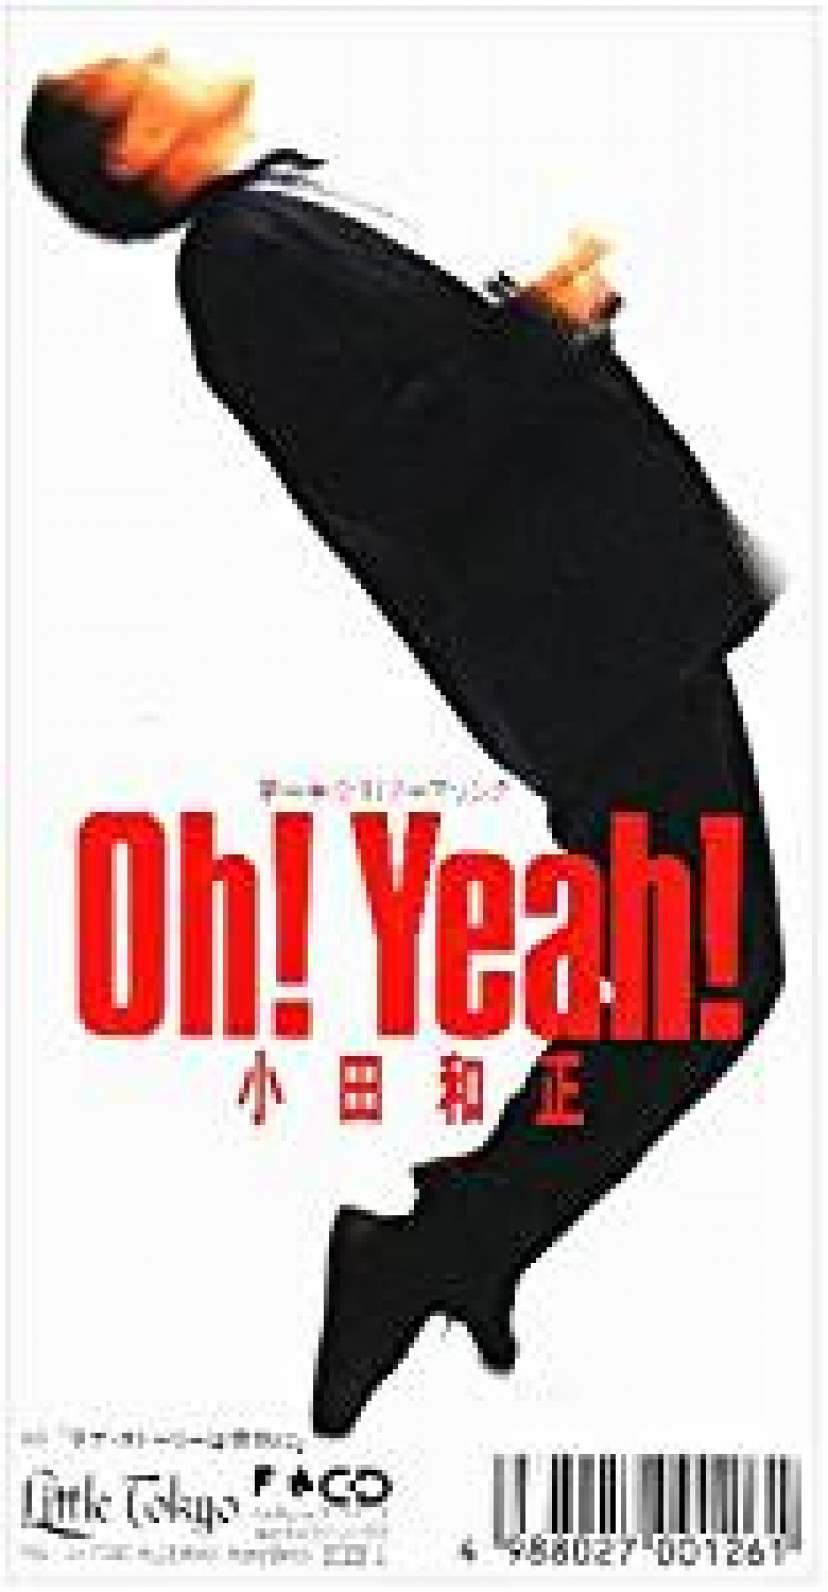 「Oh!Yeah!/ラブ・ストーリーは突然に」 小田和正